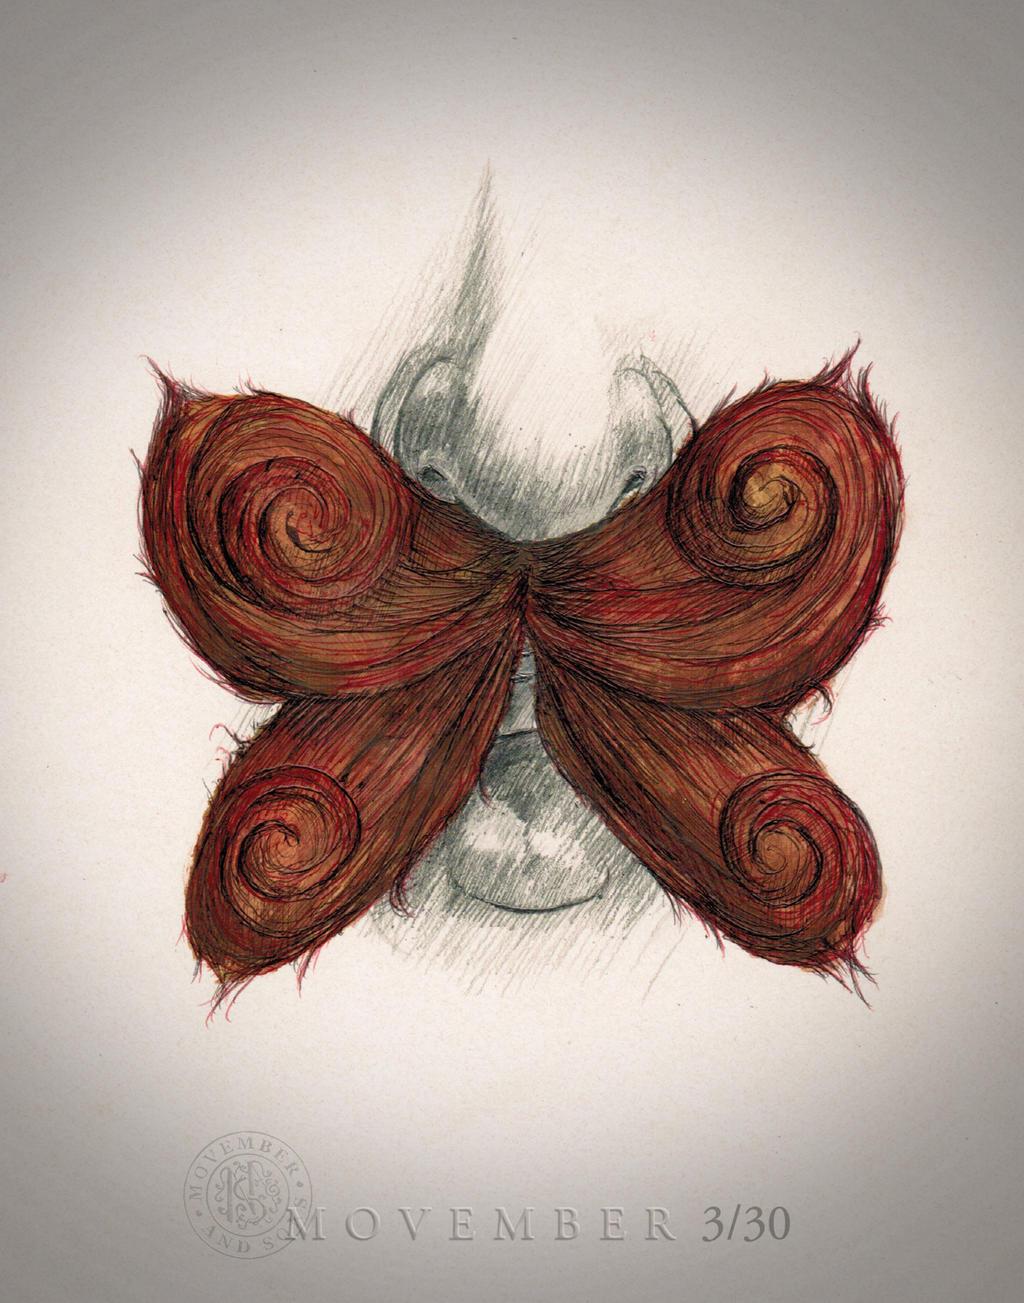 Movember Butterfly 3/30 by PeterFarmer